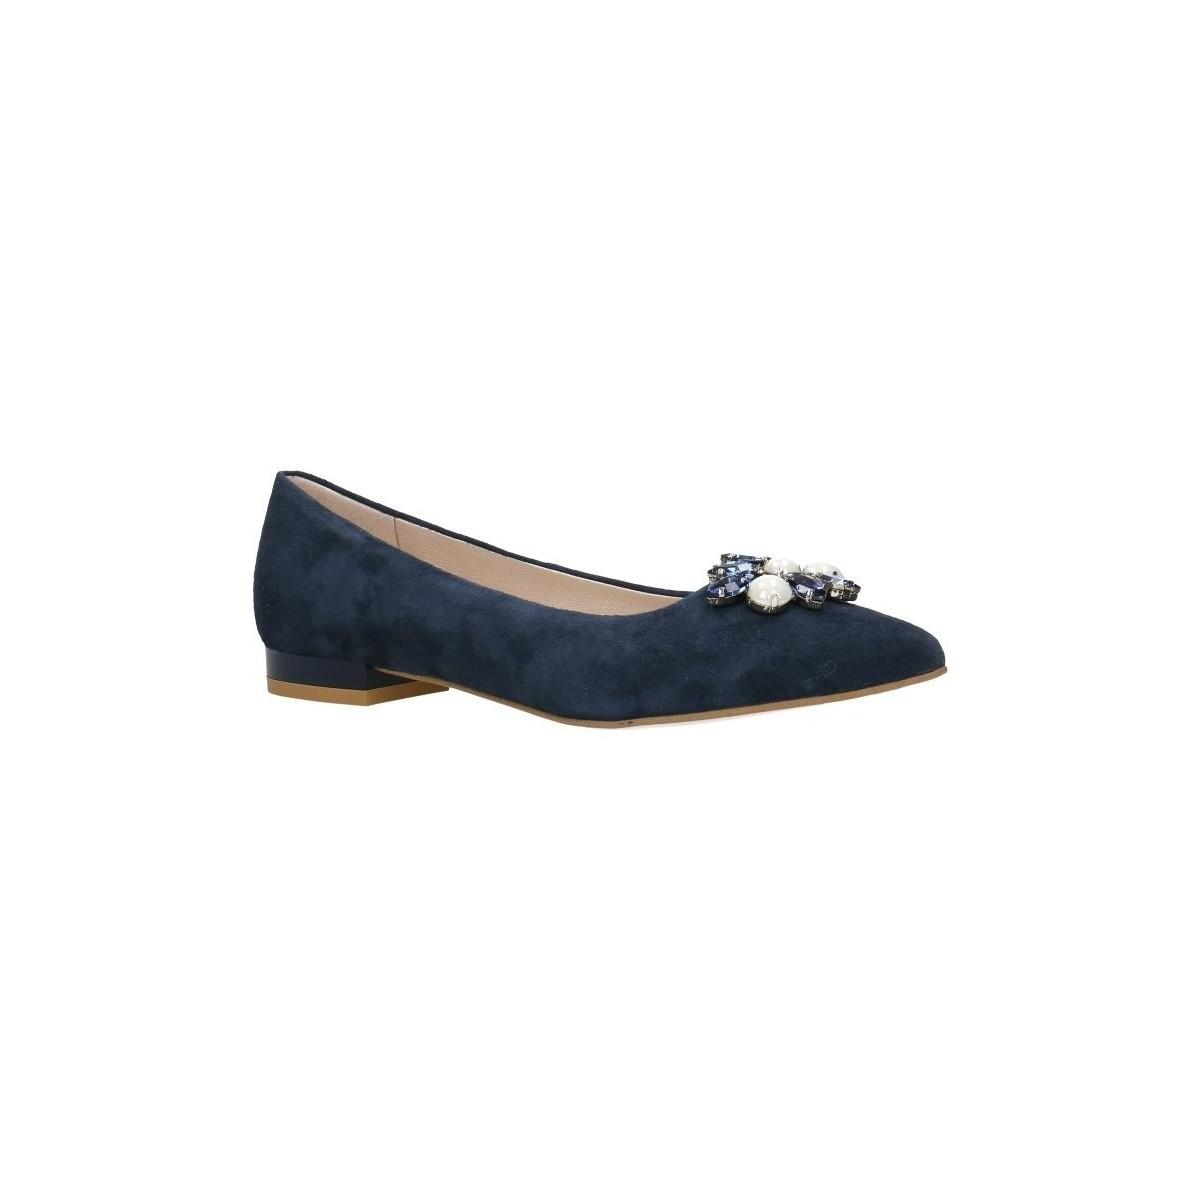 51332b290b5 Gino Rossi. Ballerinas Dah809 Navy Blue Woman Spring summer Collection 2018  Women s ...